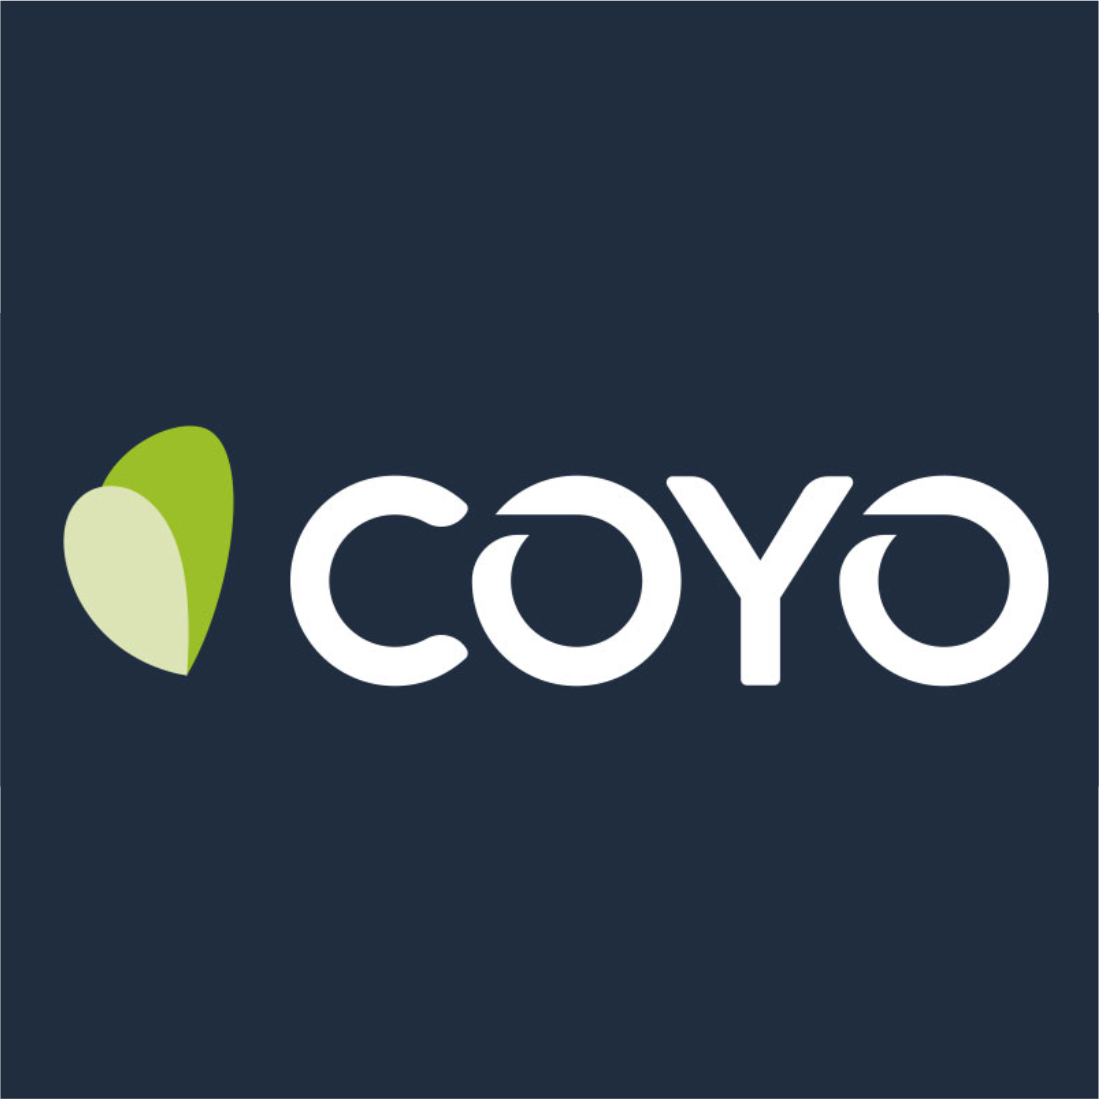 COYO.png